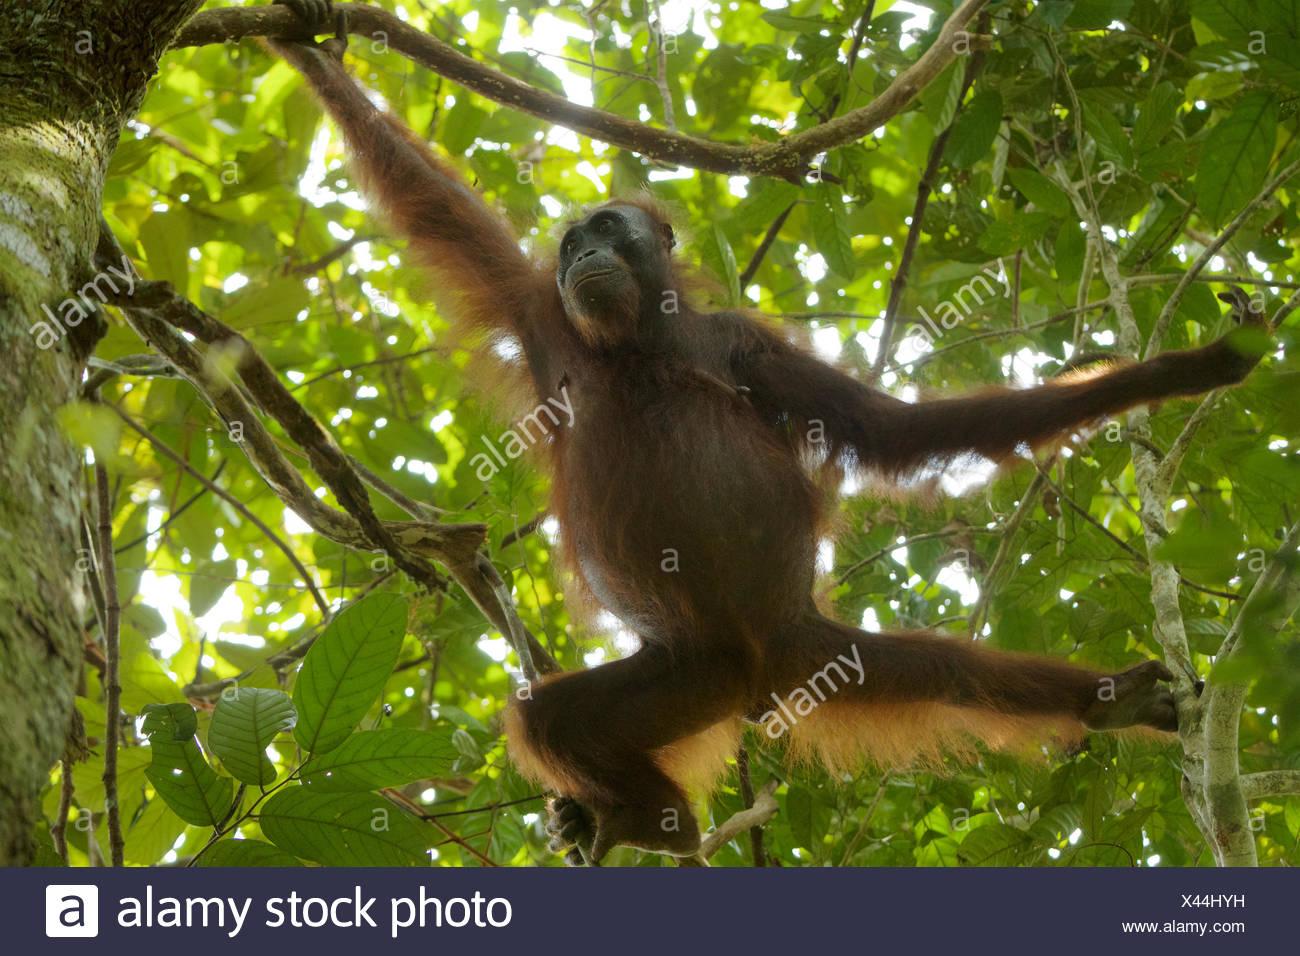 A female Bornean orangutan, Pongo pygmaeus wurmbii, climbing trees in Gunung Palung National Park. - Stock Image